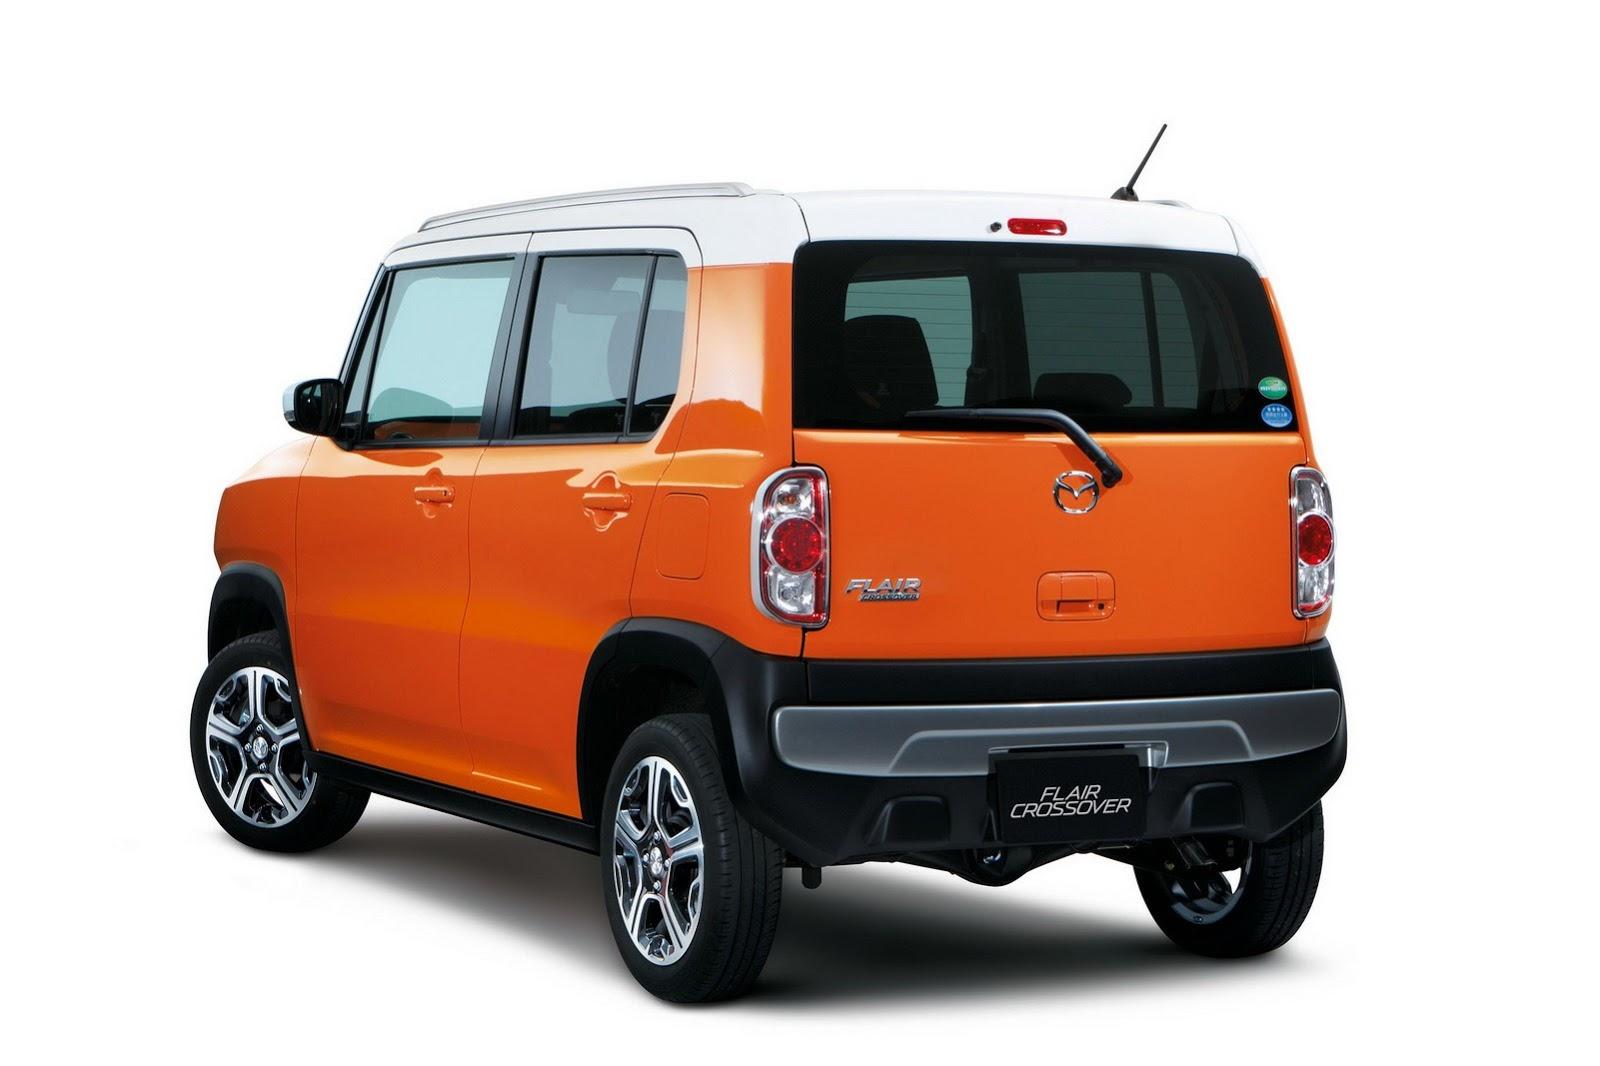 2014 - [Mazda/Suzuki] Flair Crossover / Hustler Mazda-Flair-Crossover-2%25255B3%25255D